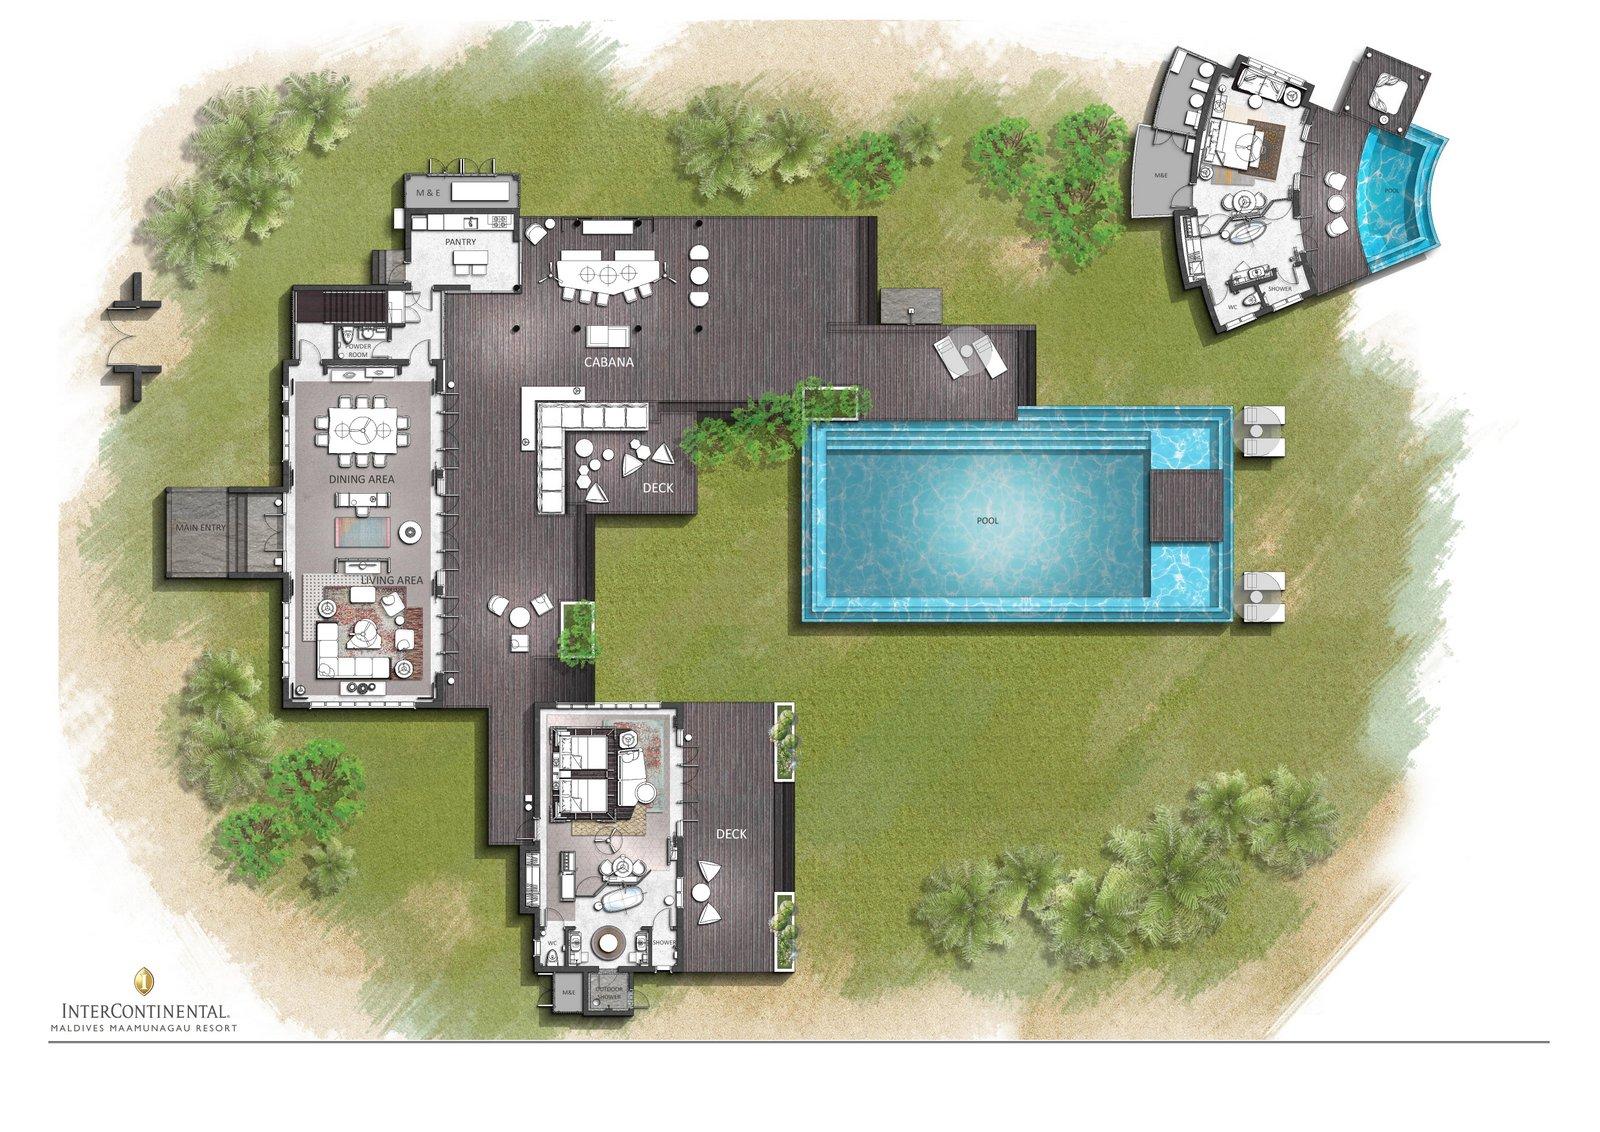 Мальдивы, отель Intercontinental Maldives Maamunagau, план-схема номера Three Bedroom Royal Beachfront Residence